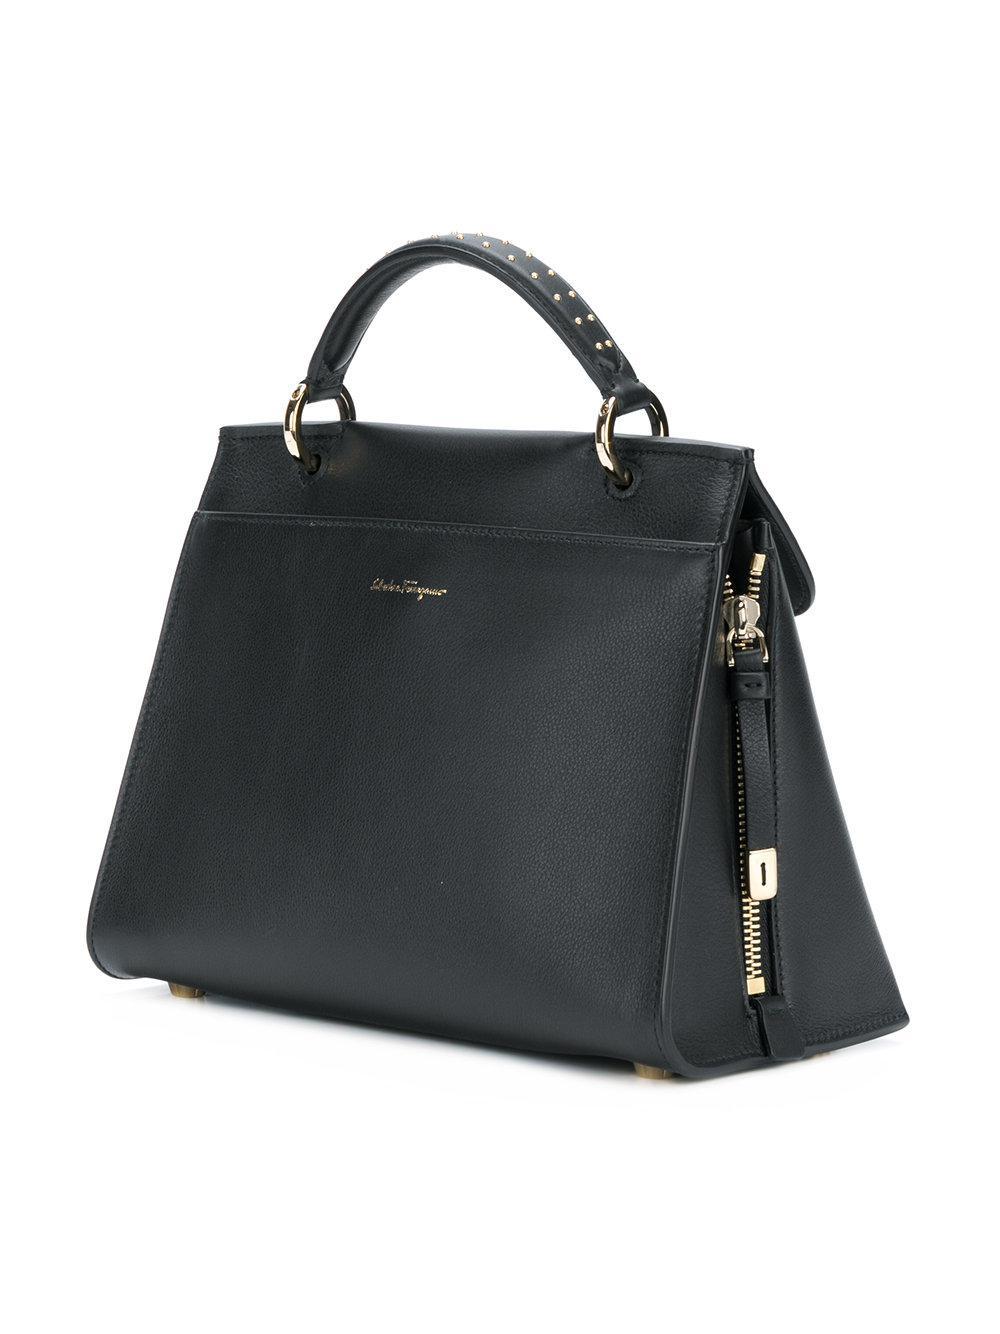 Ferragamo Leather Jet Set Tote Bag in Black